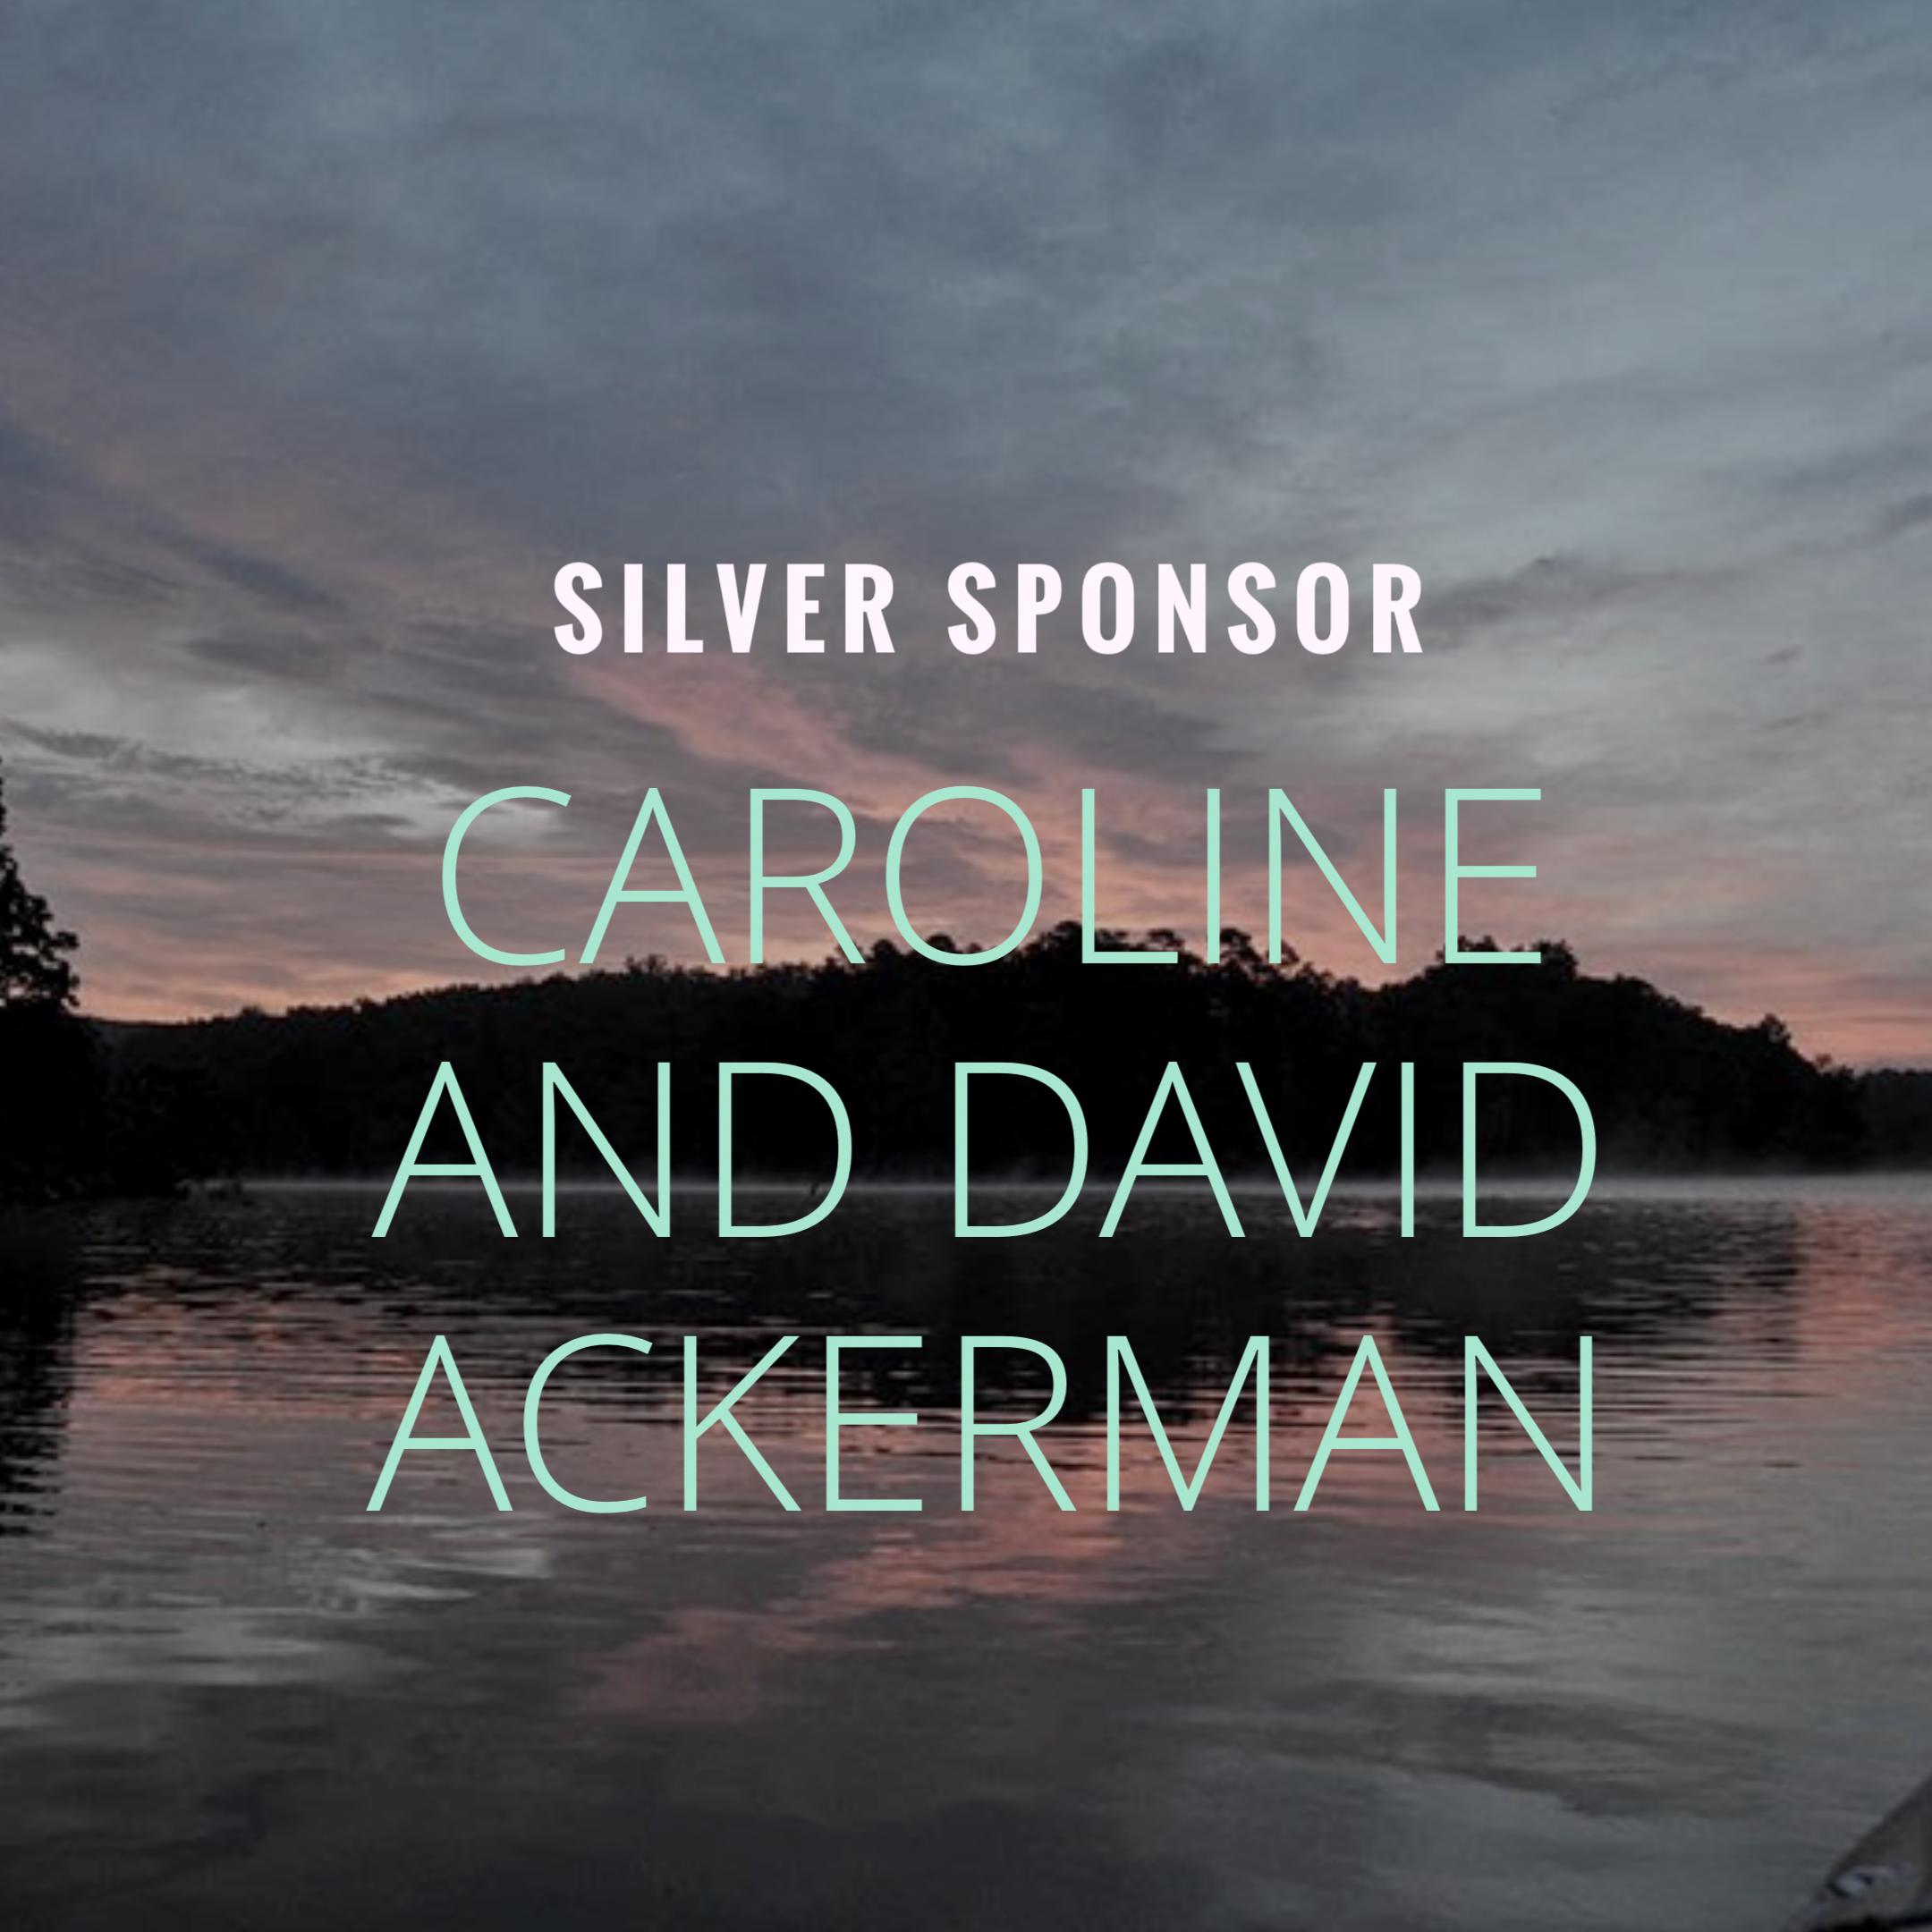 Caroline and David Ackerman